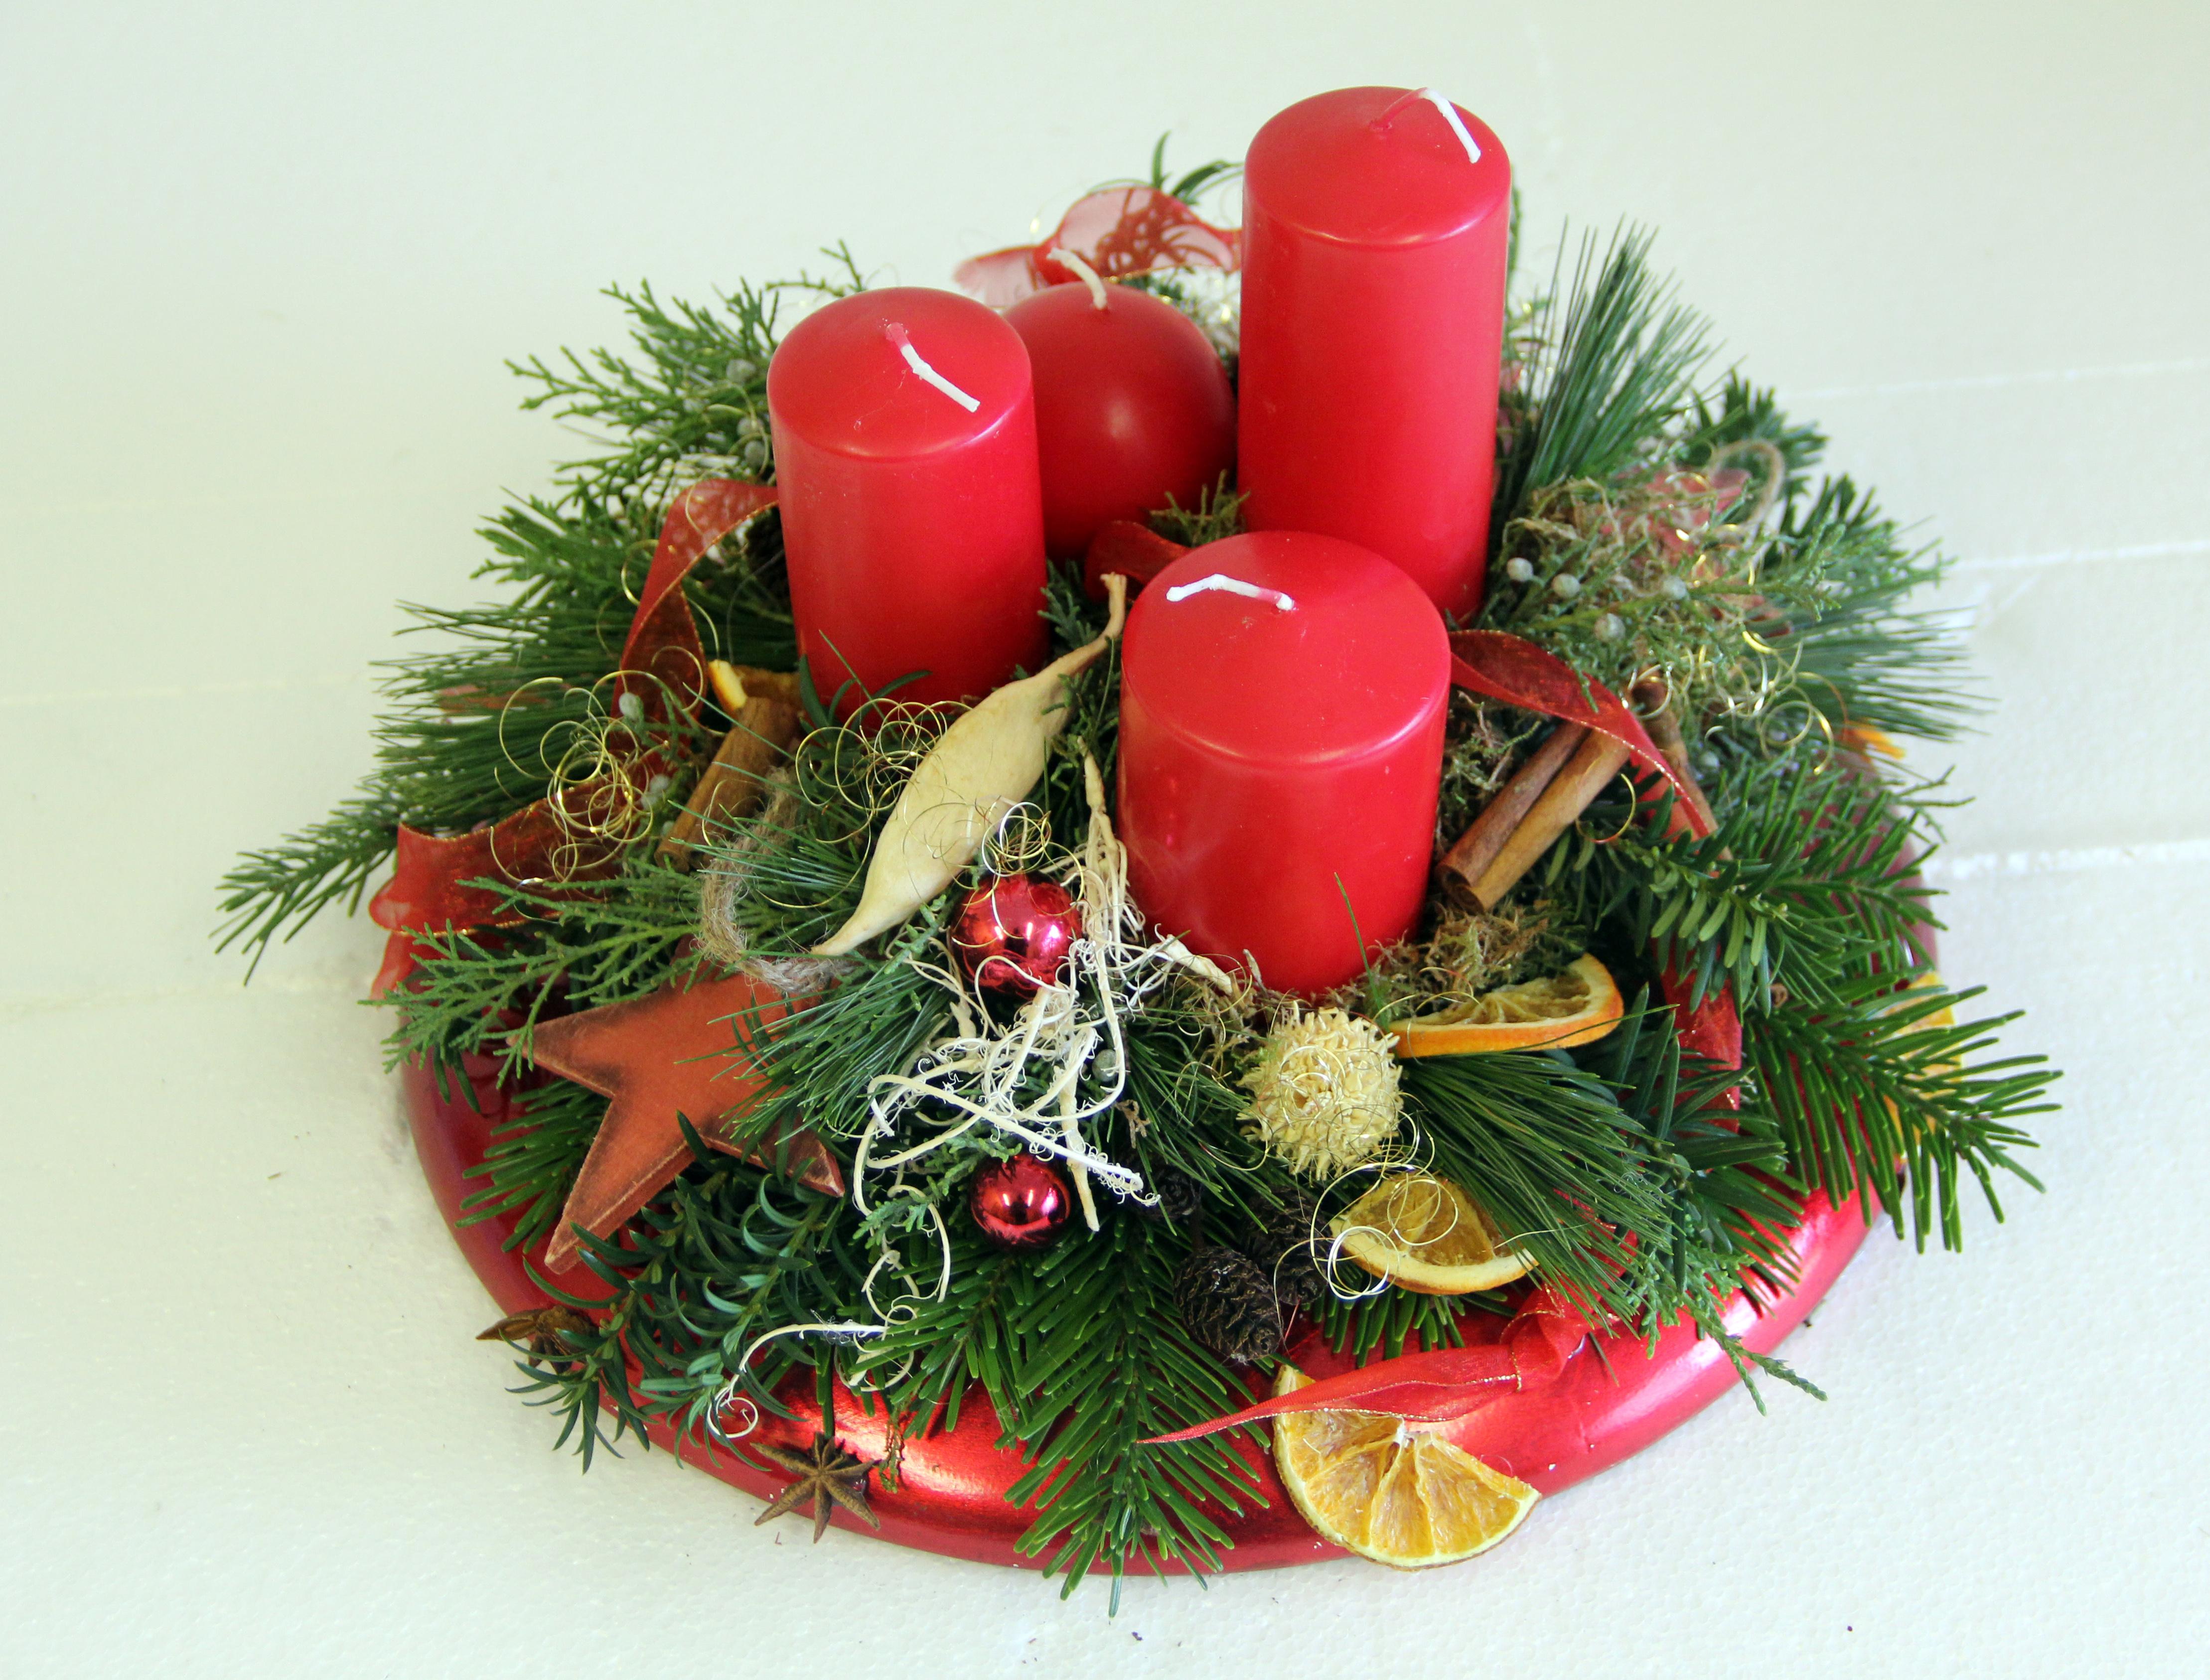 Modernes Weihnachtsgesteck In Rot